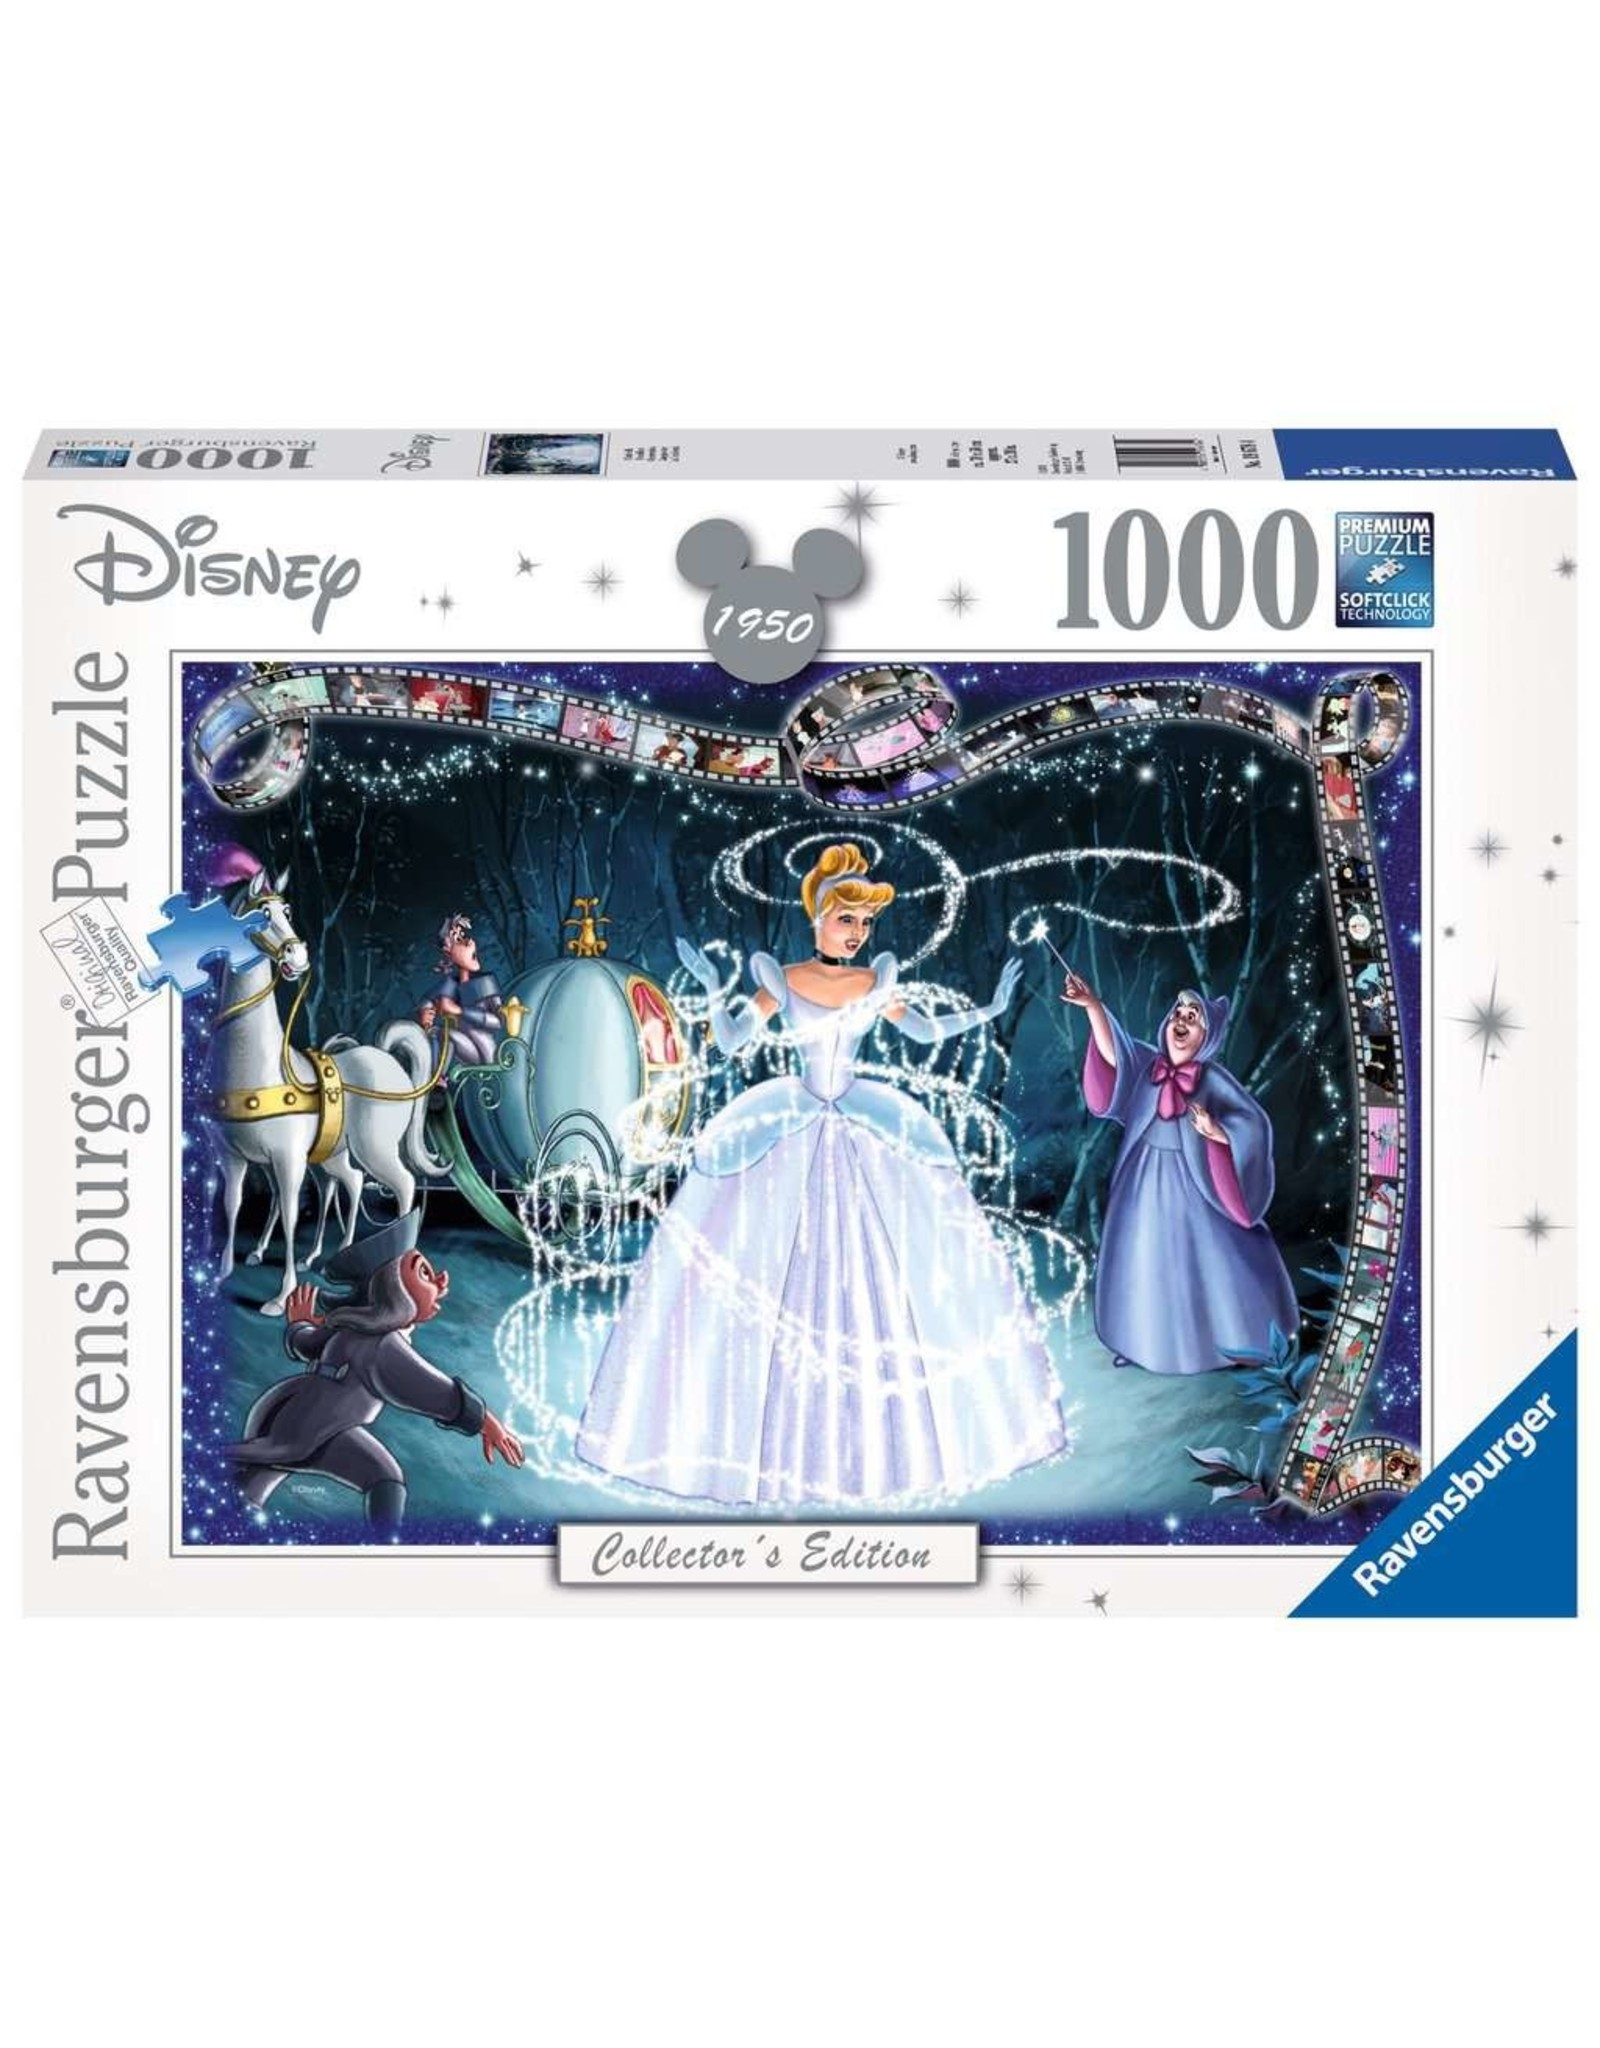 Ravensburger Cinderella 1000 pc